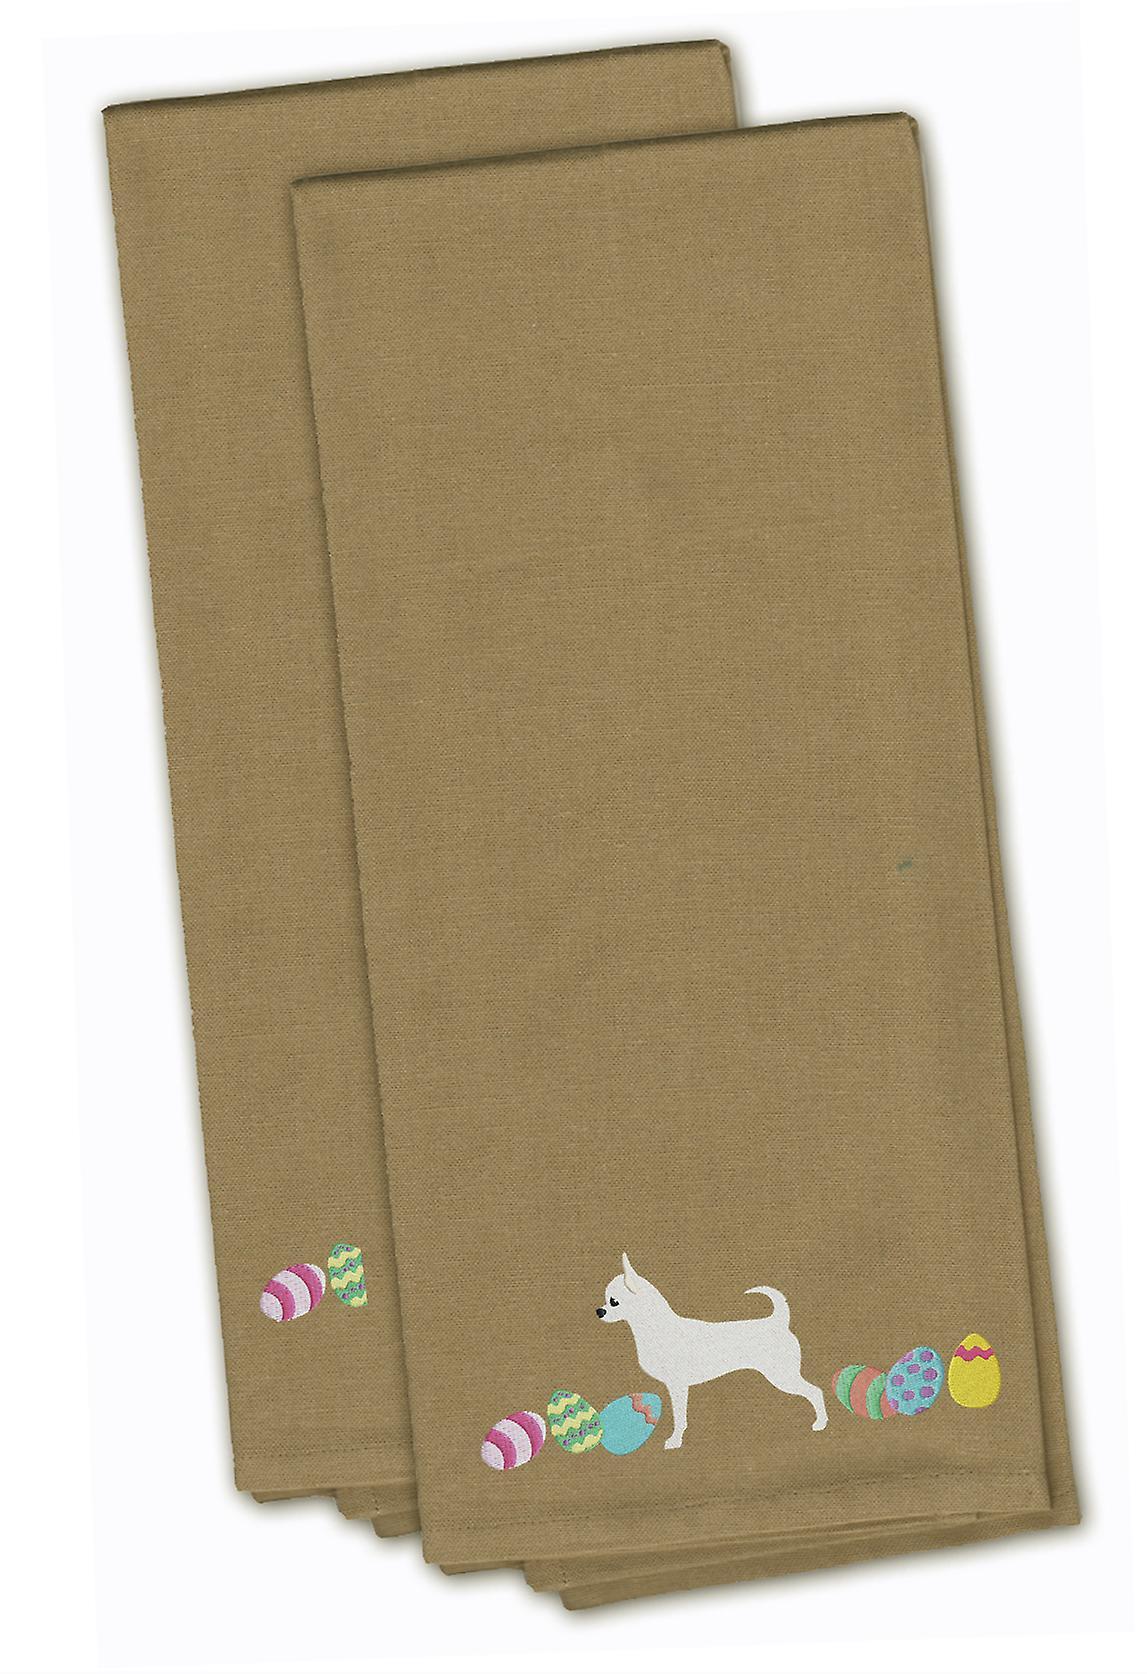 Chihuahua Pasen Tan geborduurd keuken handdoek Set van 2